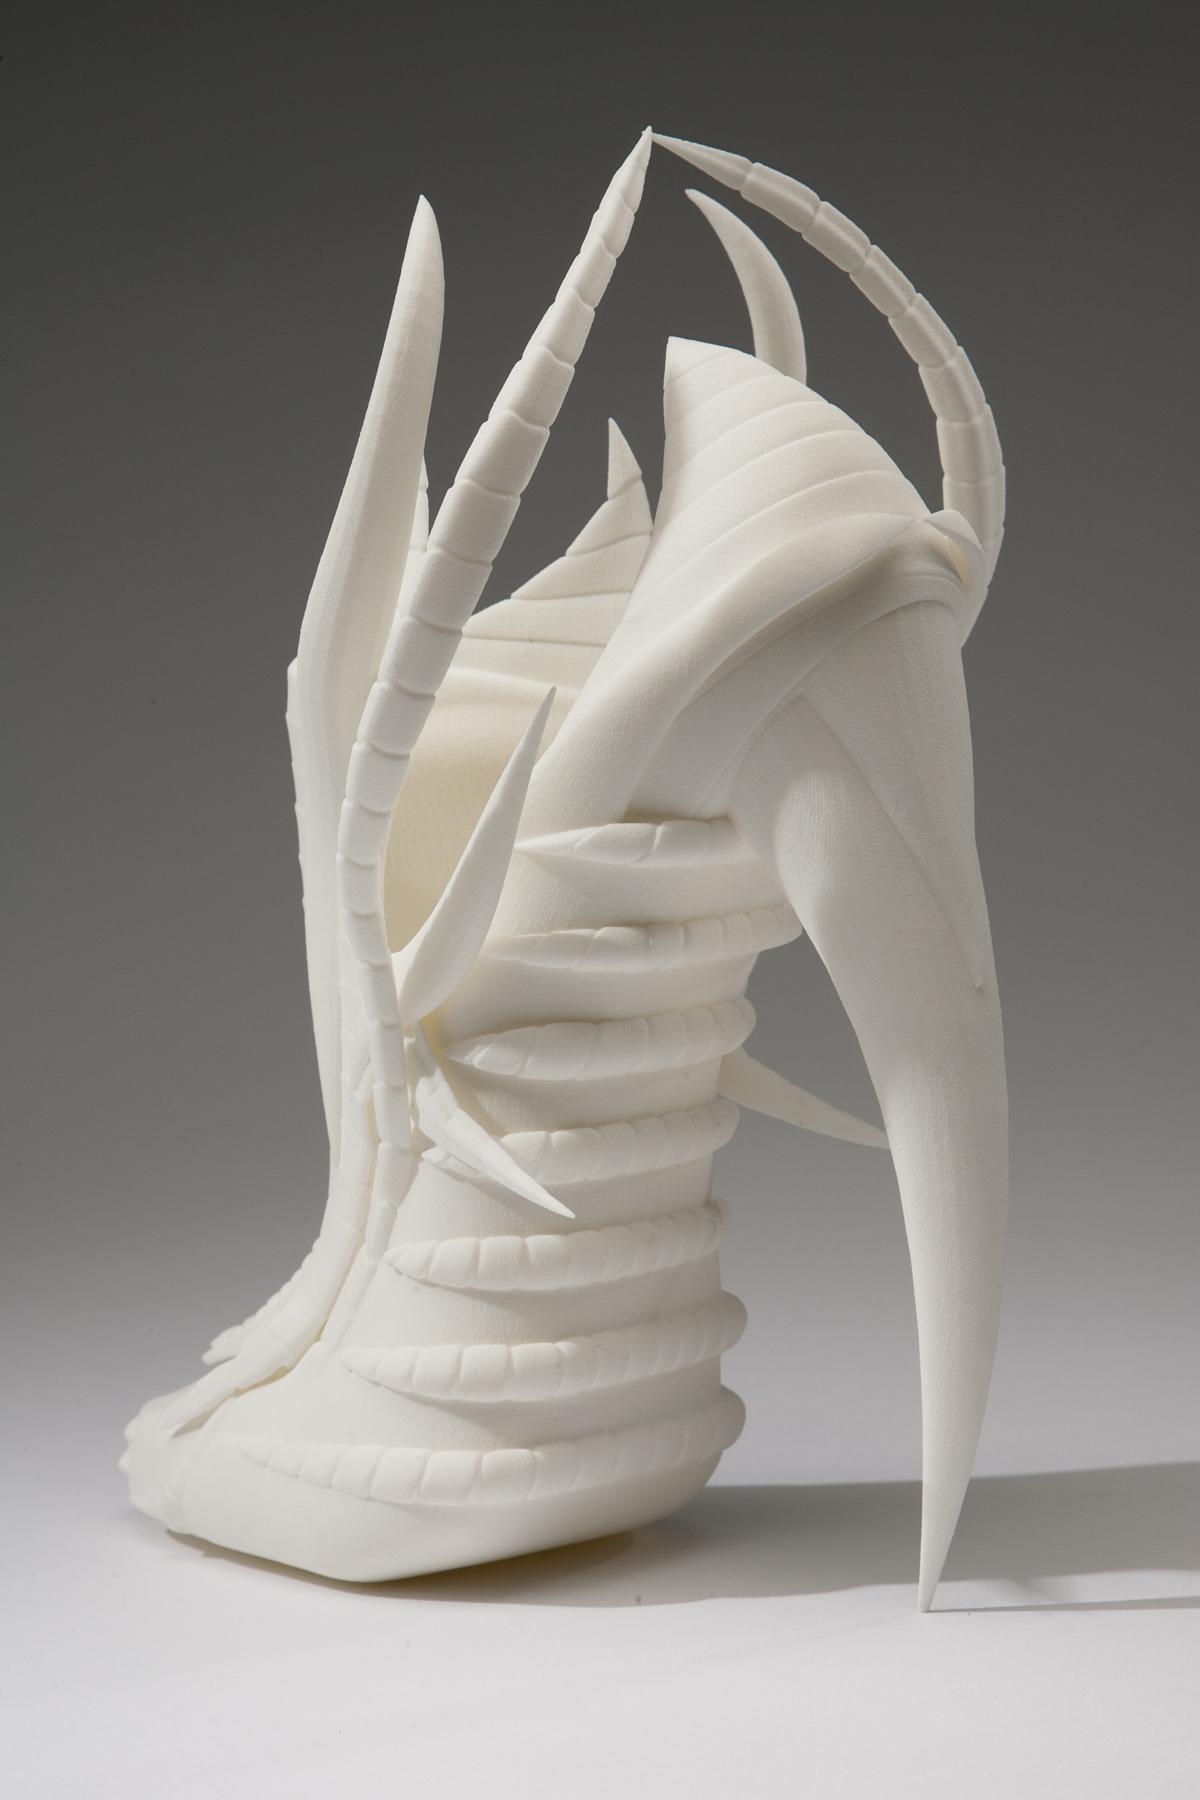 Exoskeleton-Janina-Alleyne-03